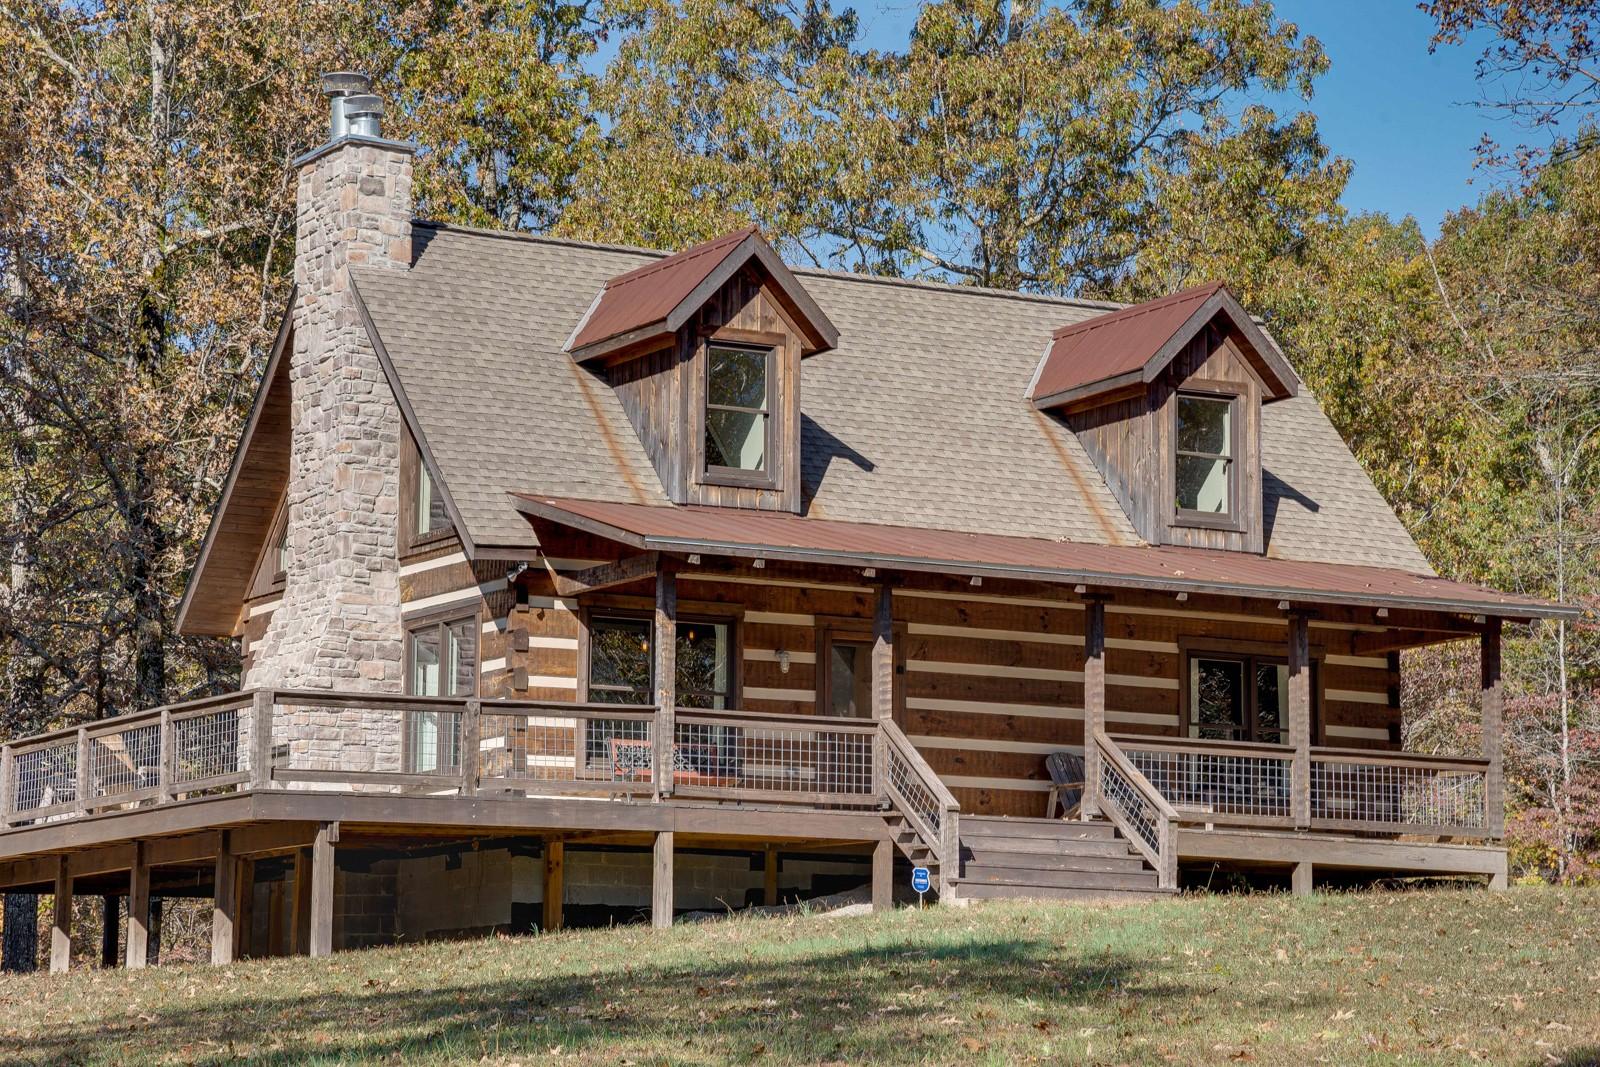 7327 Brush Creek Rd, Fairview, TN 37062 - Fairview, TN real estate listing